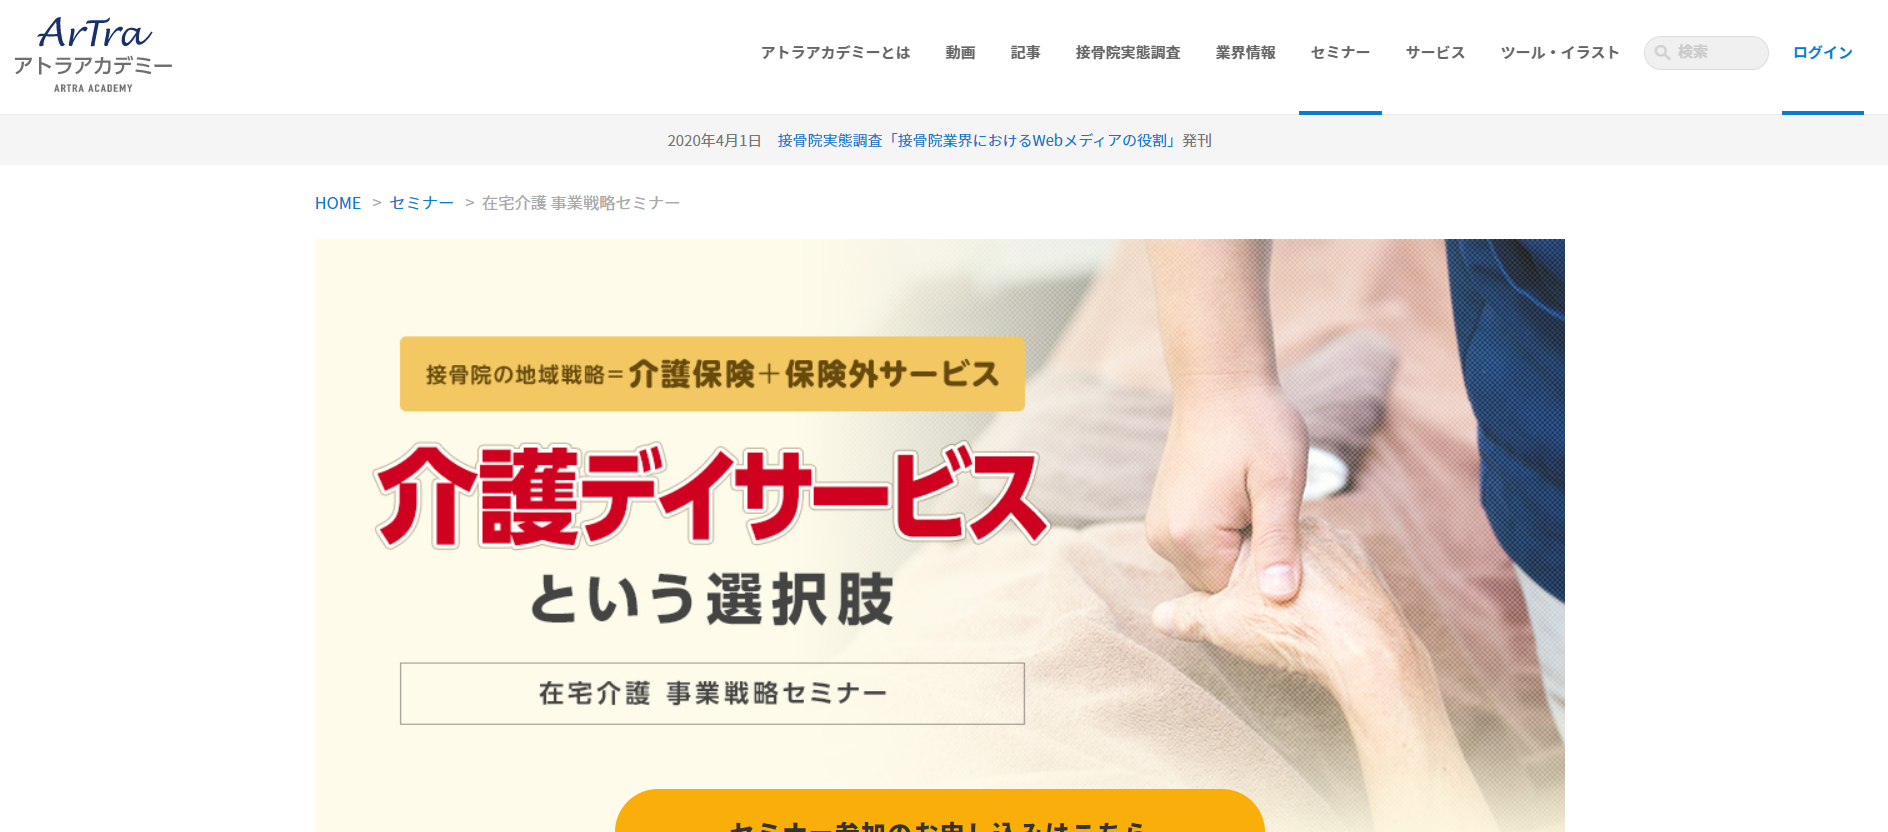 アトラ株式会社セミナー